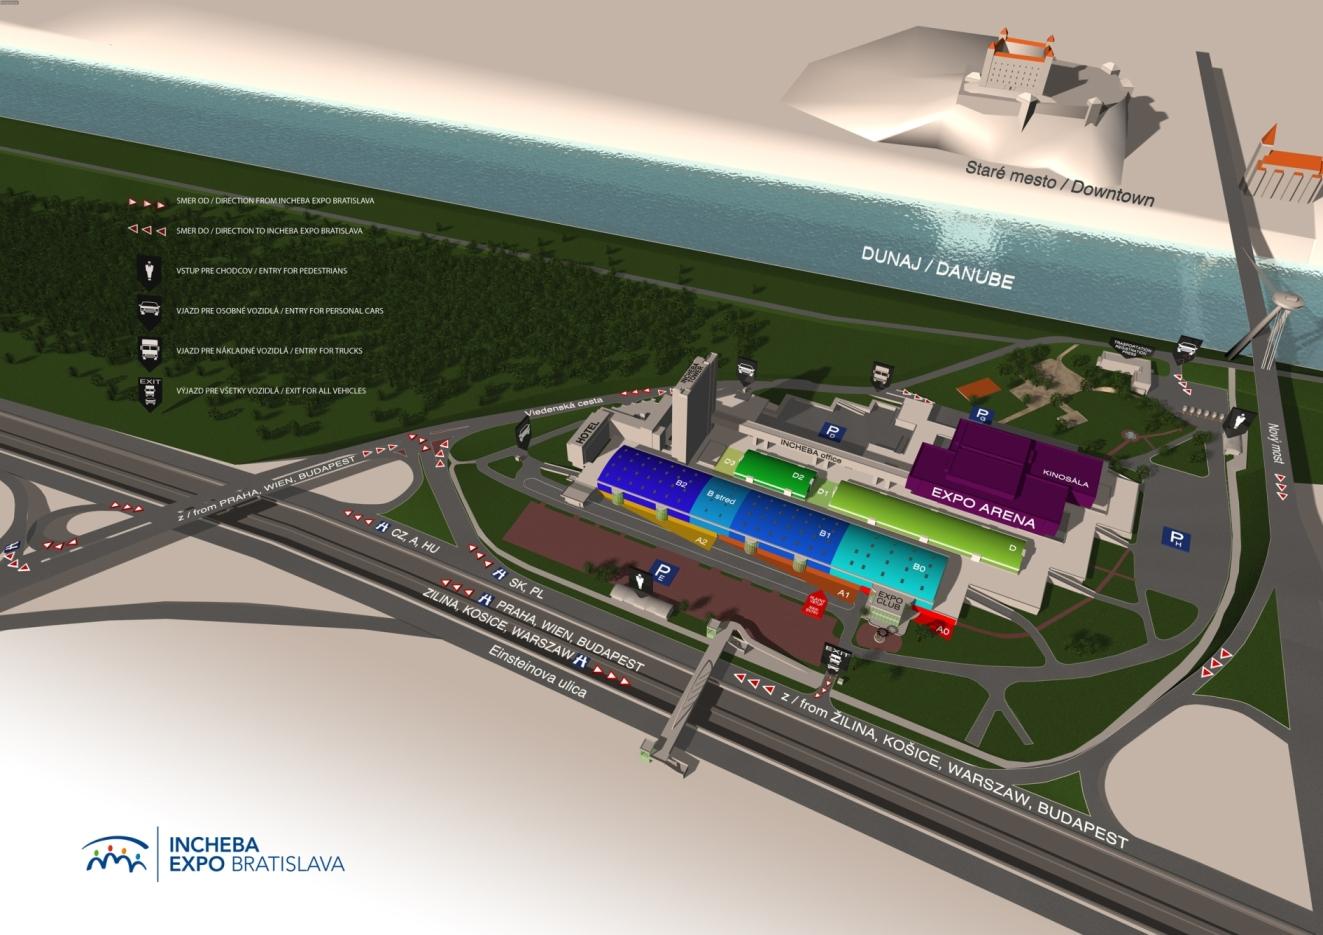 Mapa veletrhu MODDOM 2019 - INCHEBA EXPO BRATISLAVA